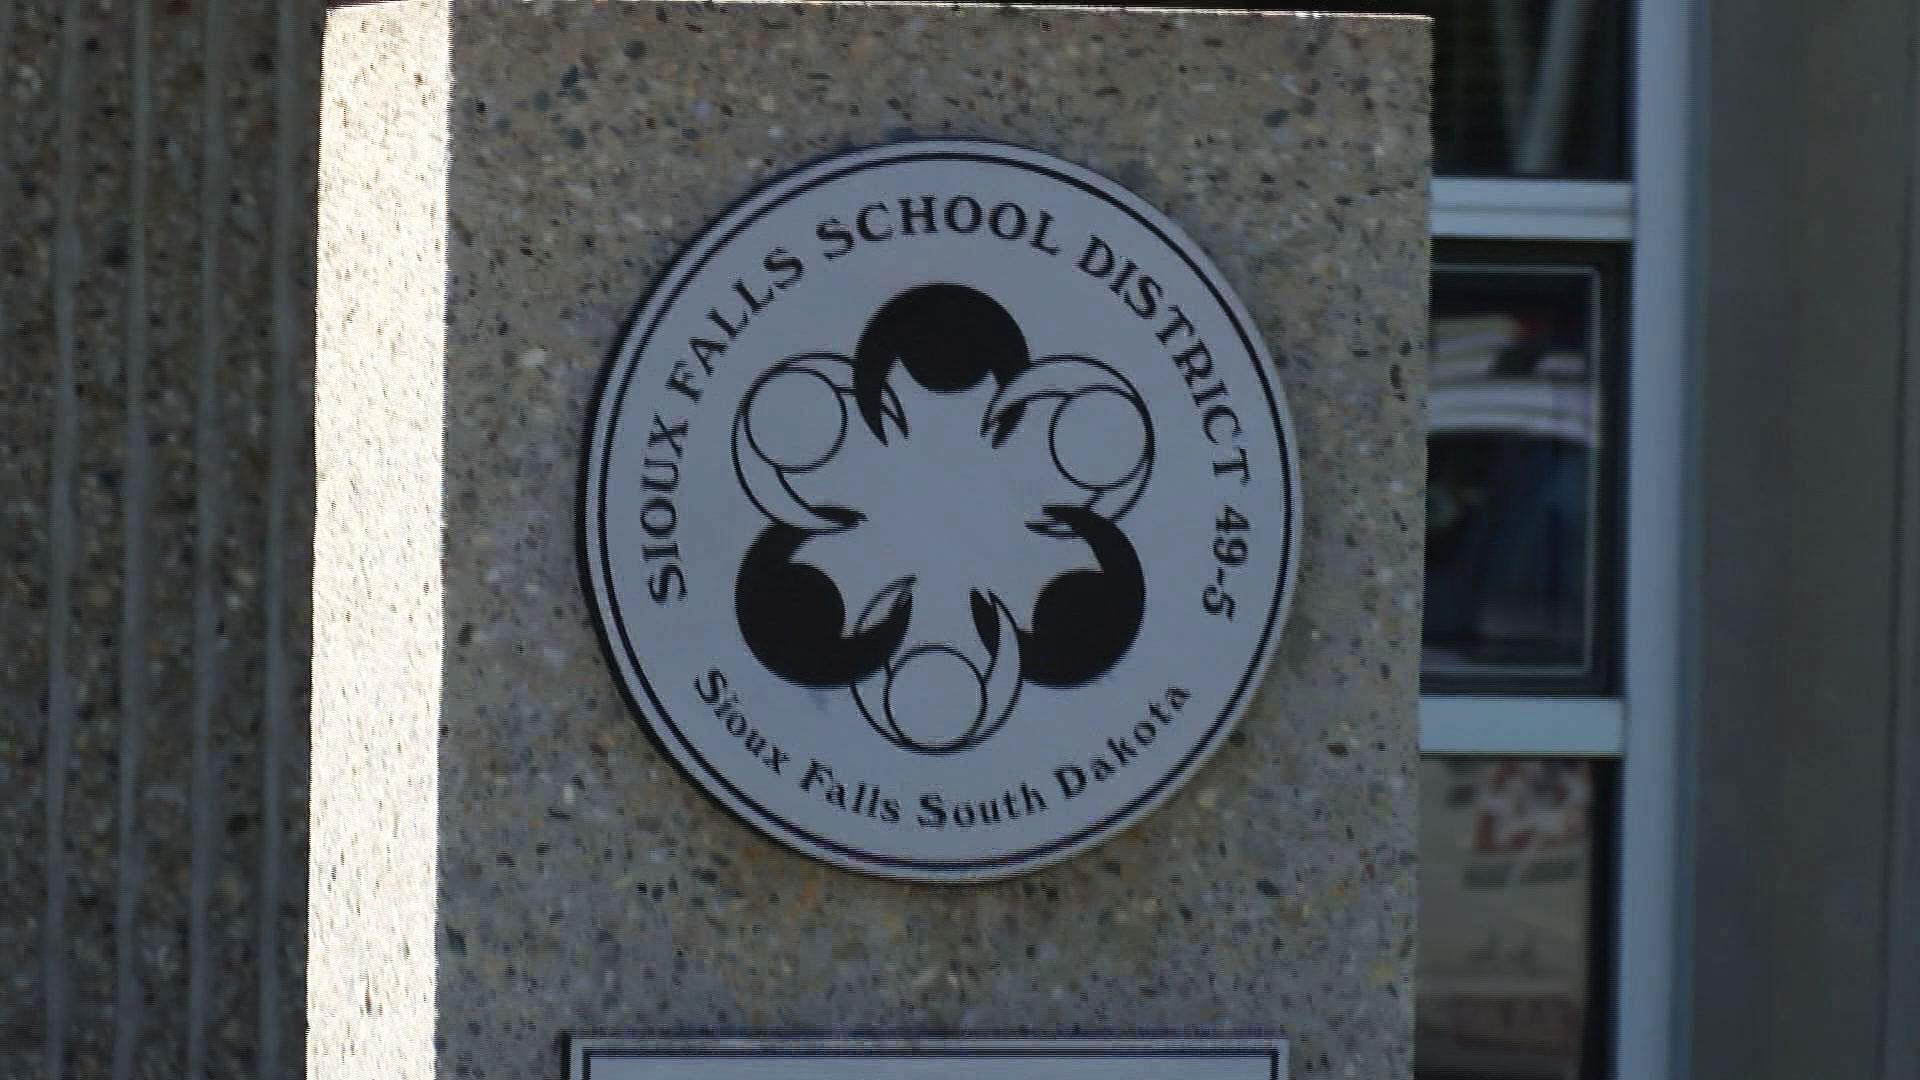 KELO Sioux Falls School District3